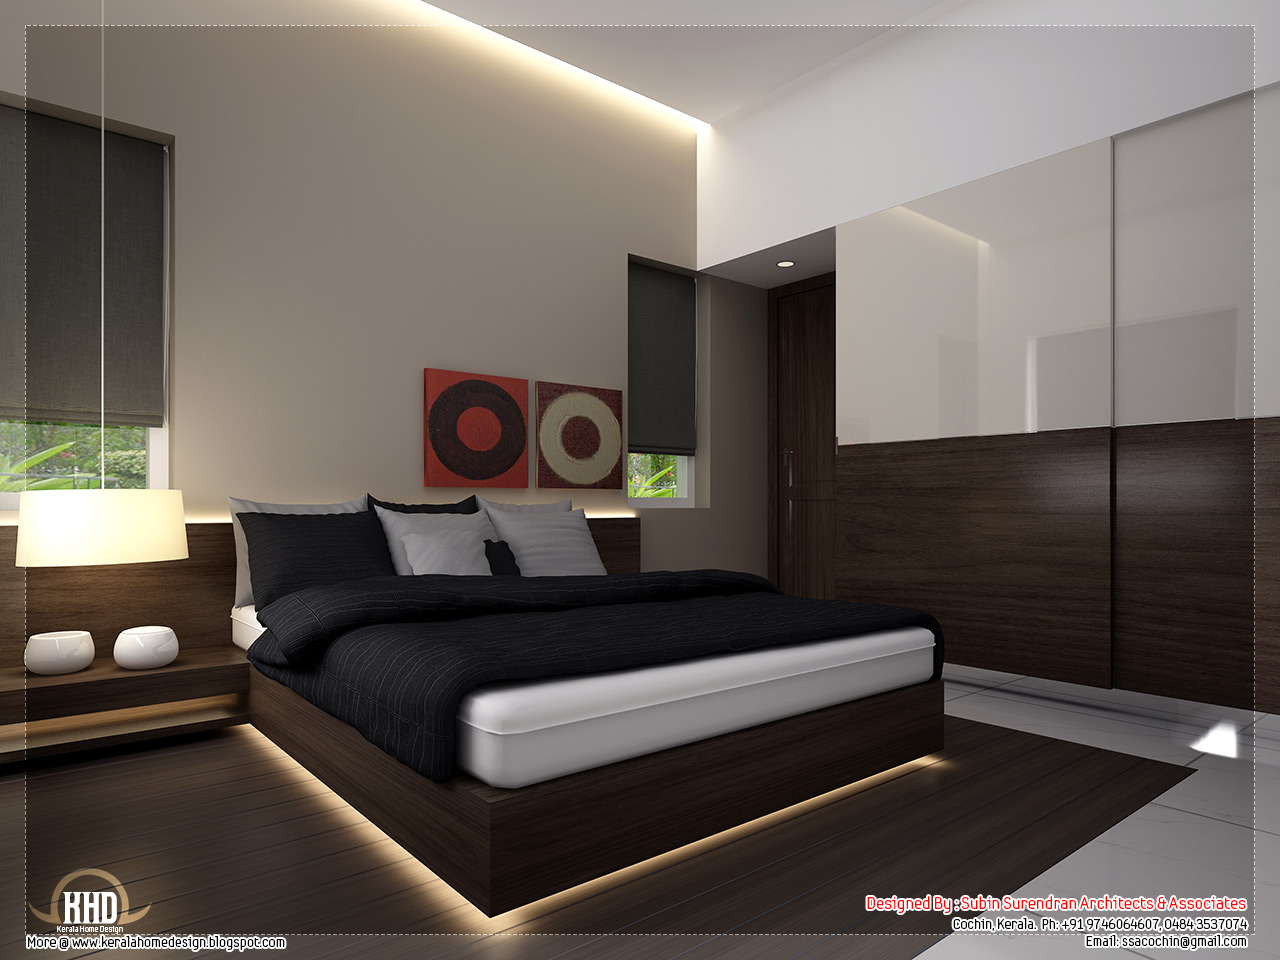 Beautiful home interior designs - Kerala home design and floor plans